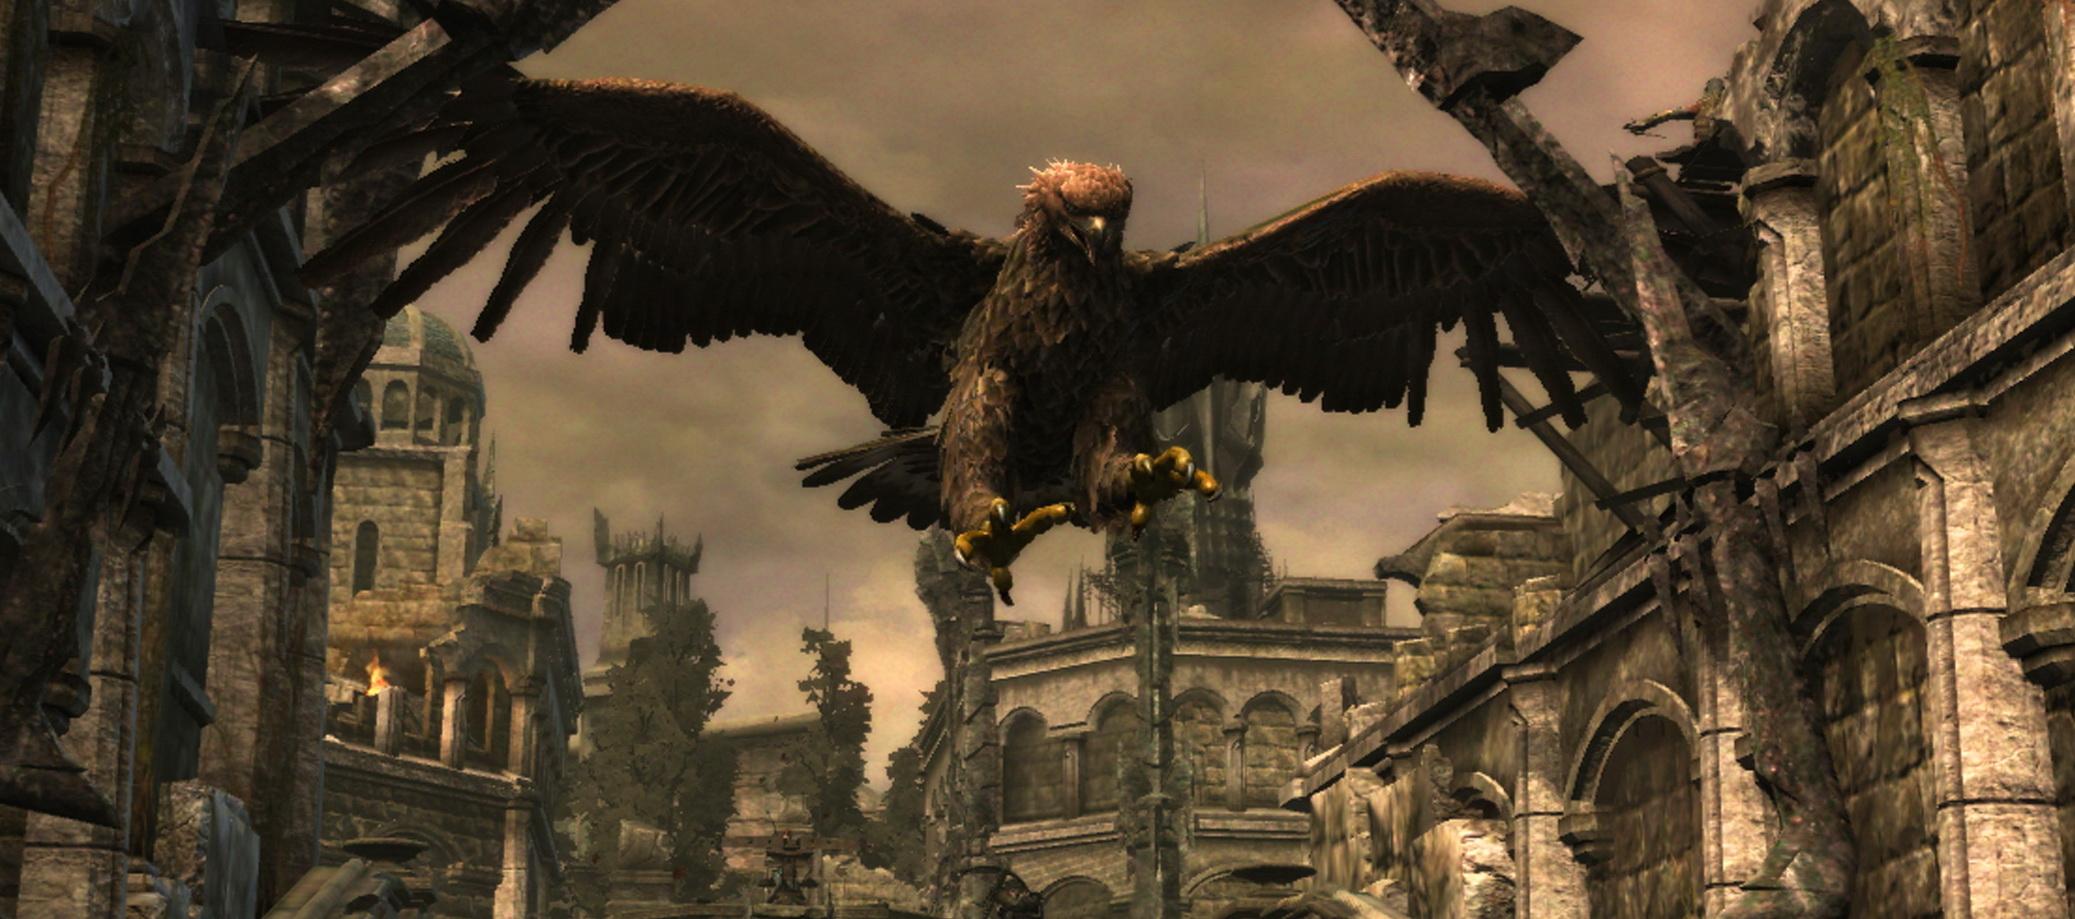 great_eagle.jpg